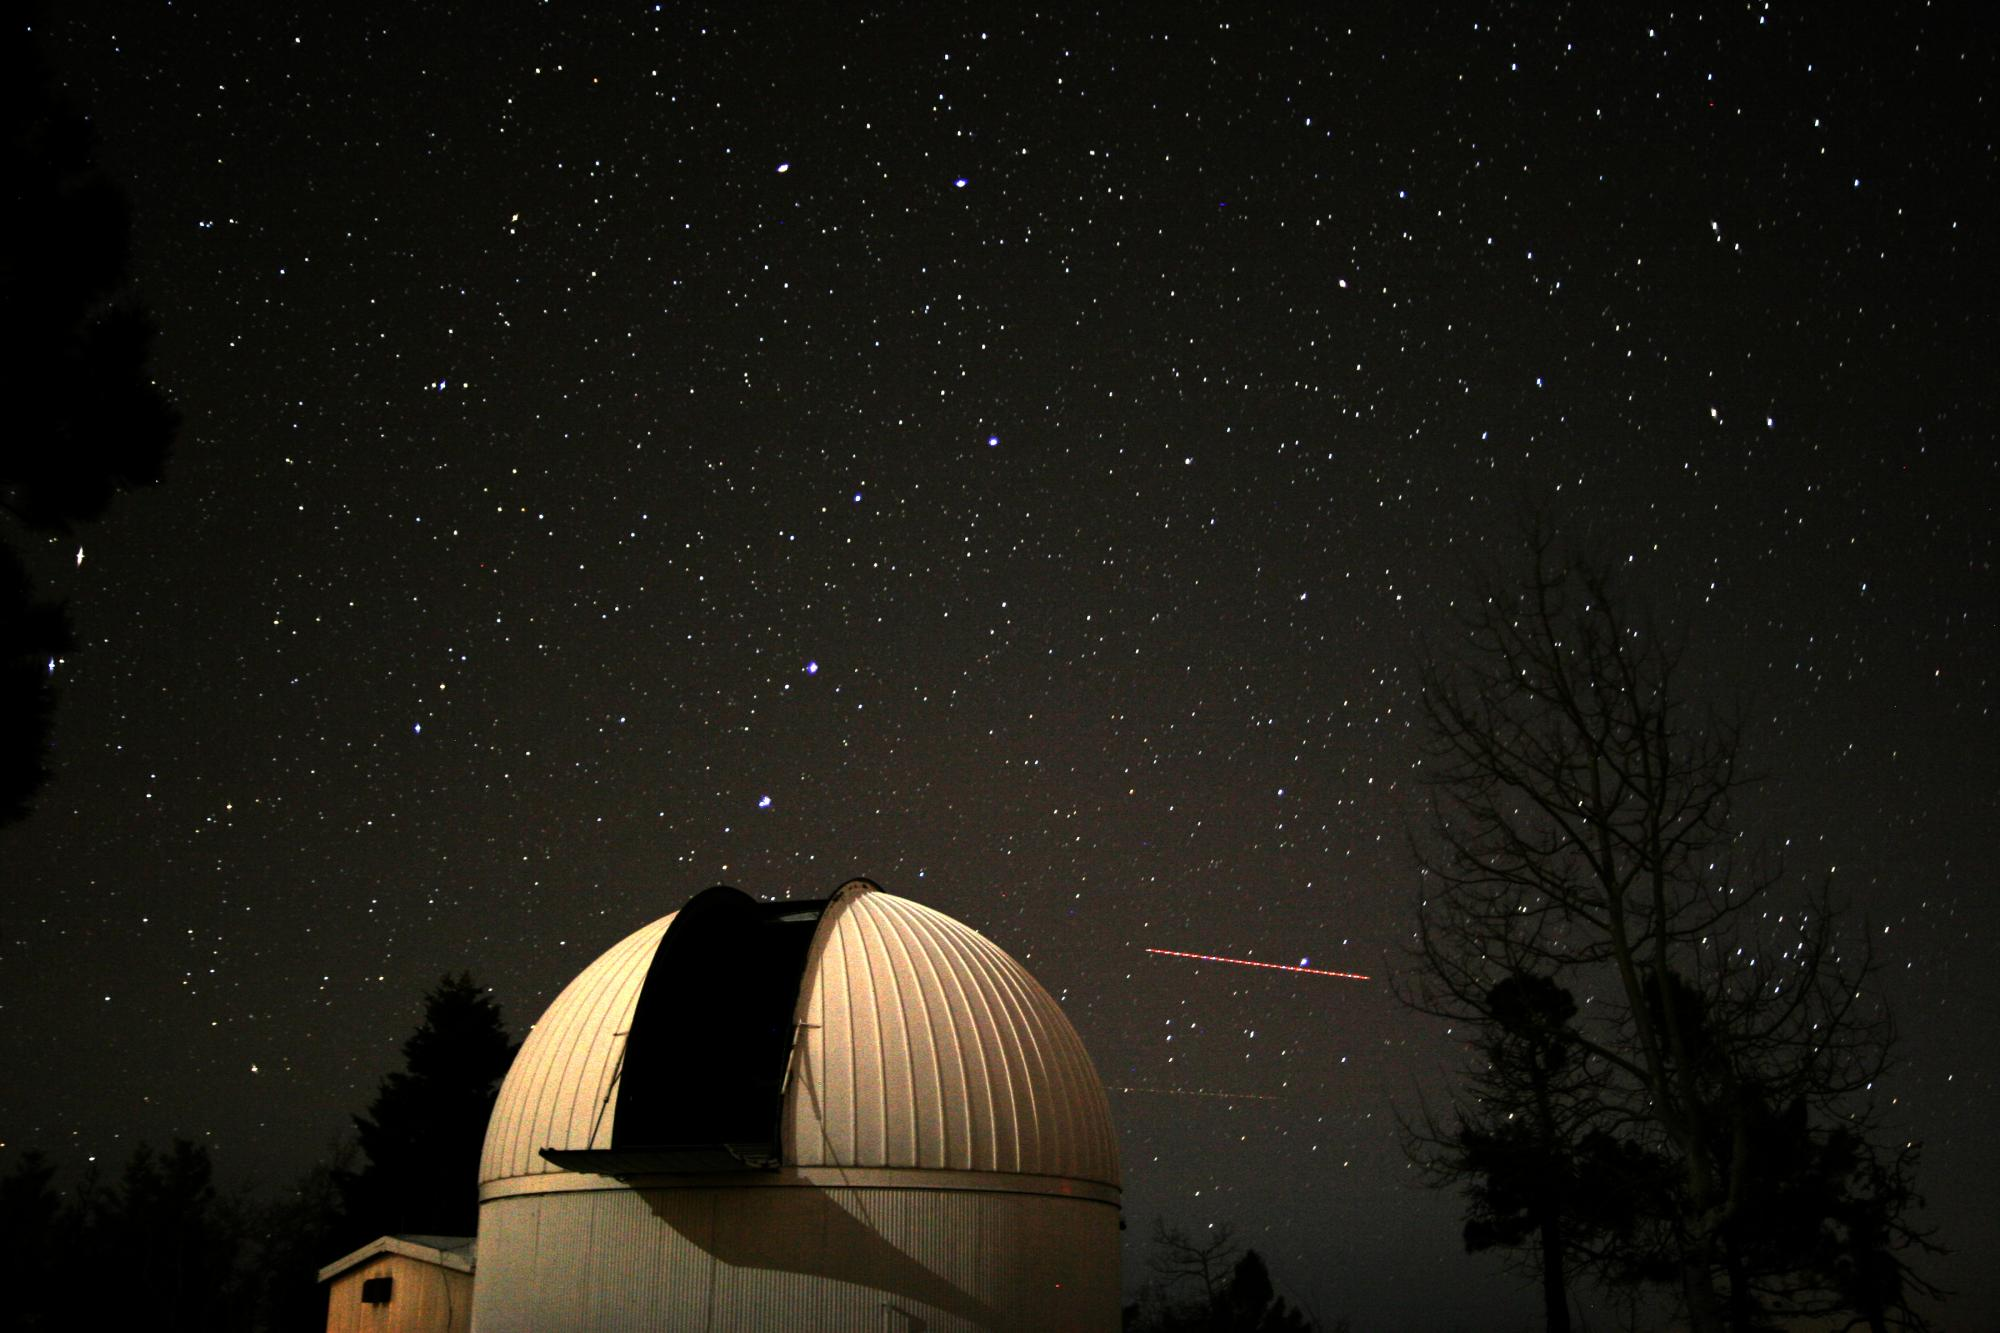 The Catalina Sky Survey 60-inch telescope atop Mt. Lemmon.